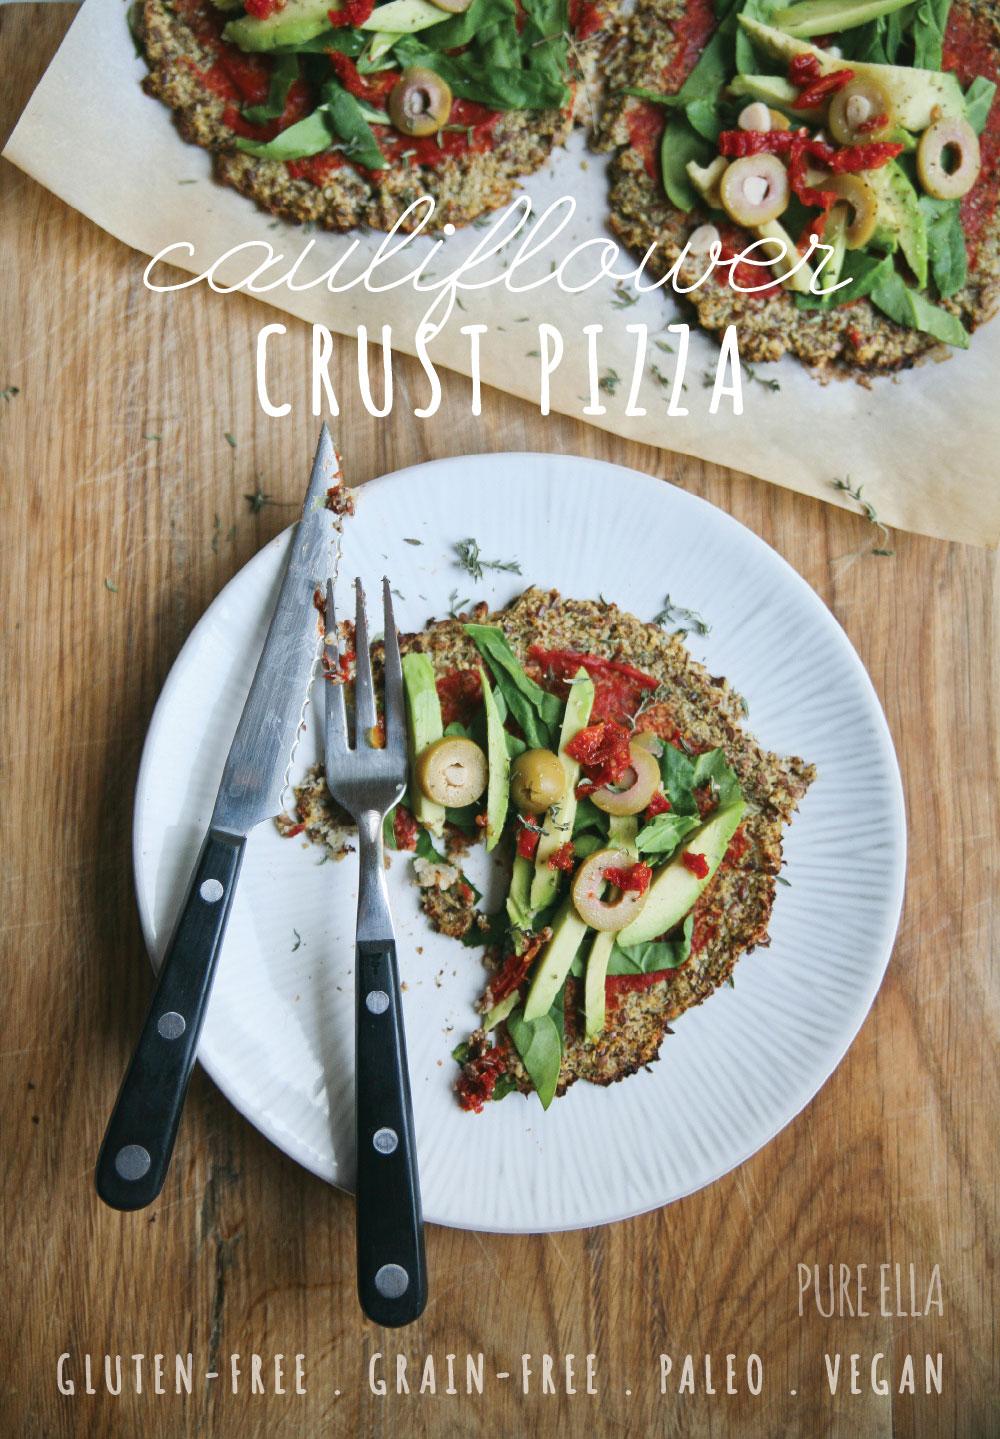 Pure-Ella-gluten-free-paleo-vegan-cauliflower-crust-pizza